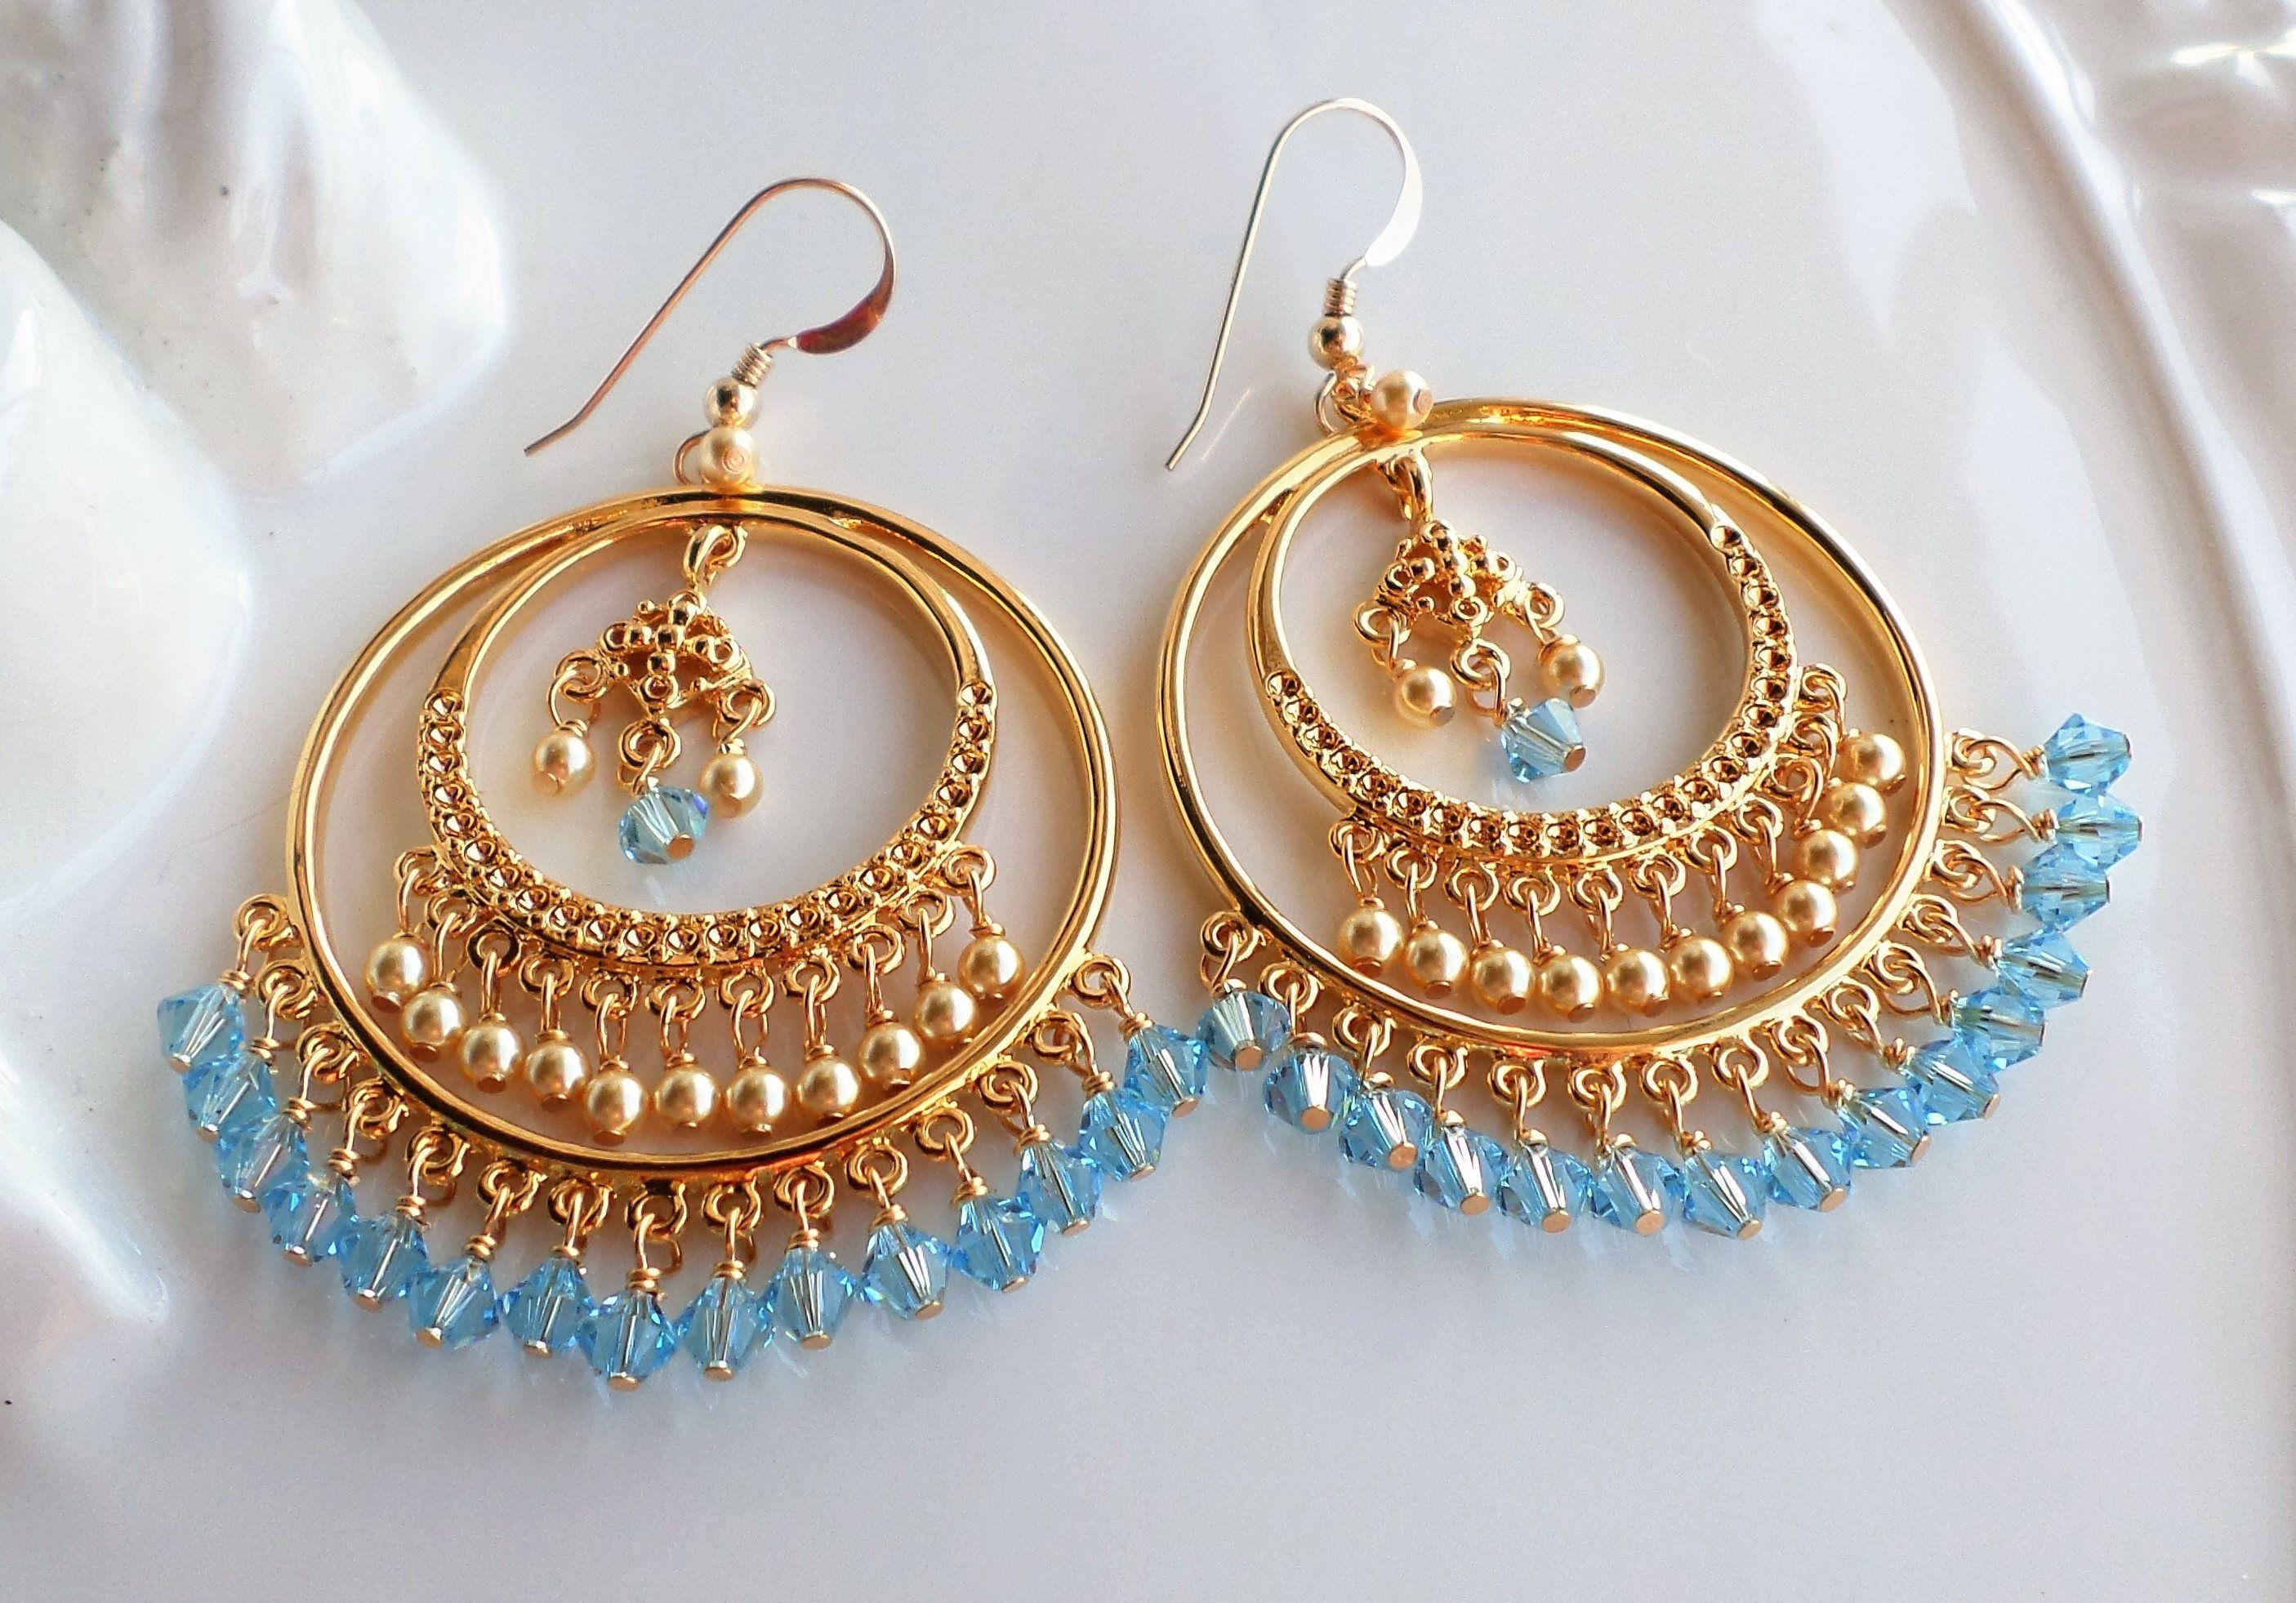 Gold chandelier earrings large big gold hoop earrings gold pearl gold chandelier earrings large big gold hoop earrings gold pearl chandelier earring aqua aloadofball Images